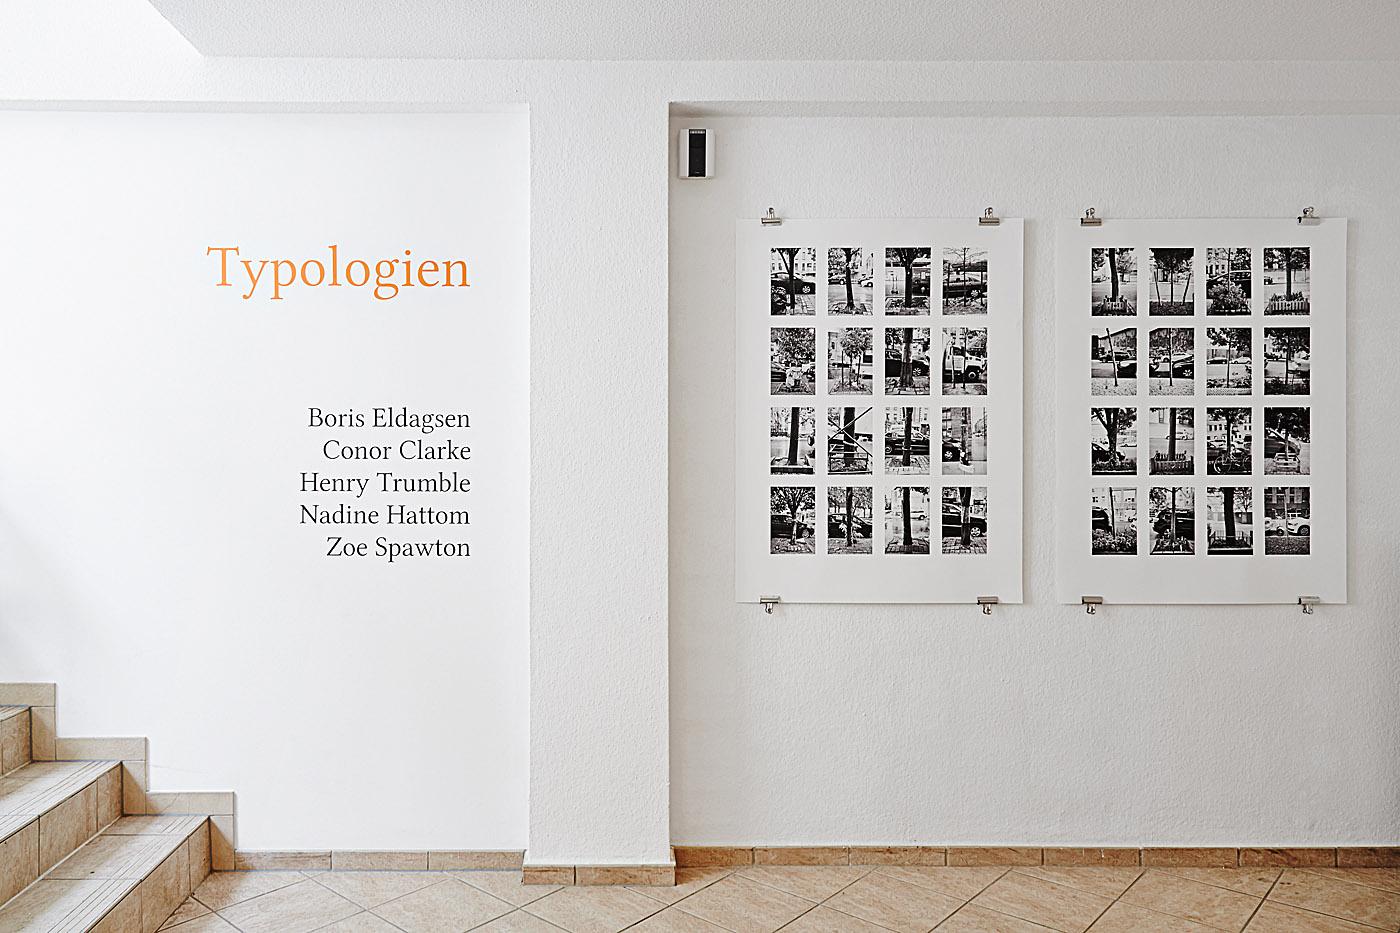 Typologien , 2014. Installation view, group exhibition, Jarvis Dooney Galerie, Berlin, Germany.